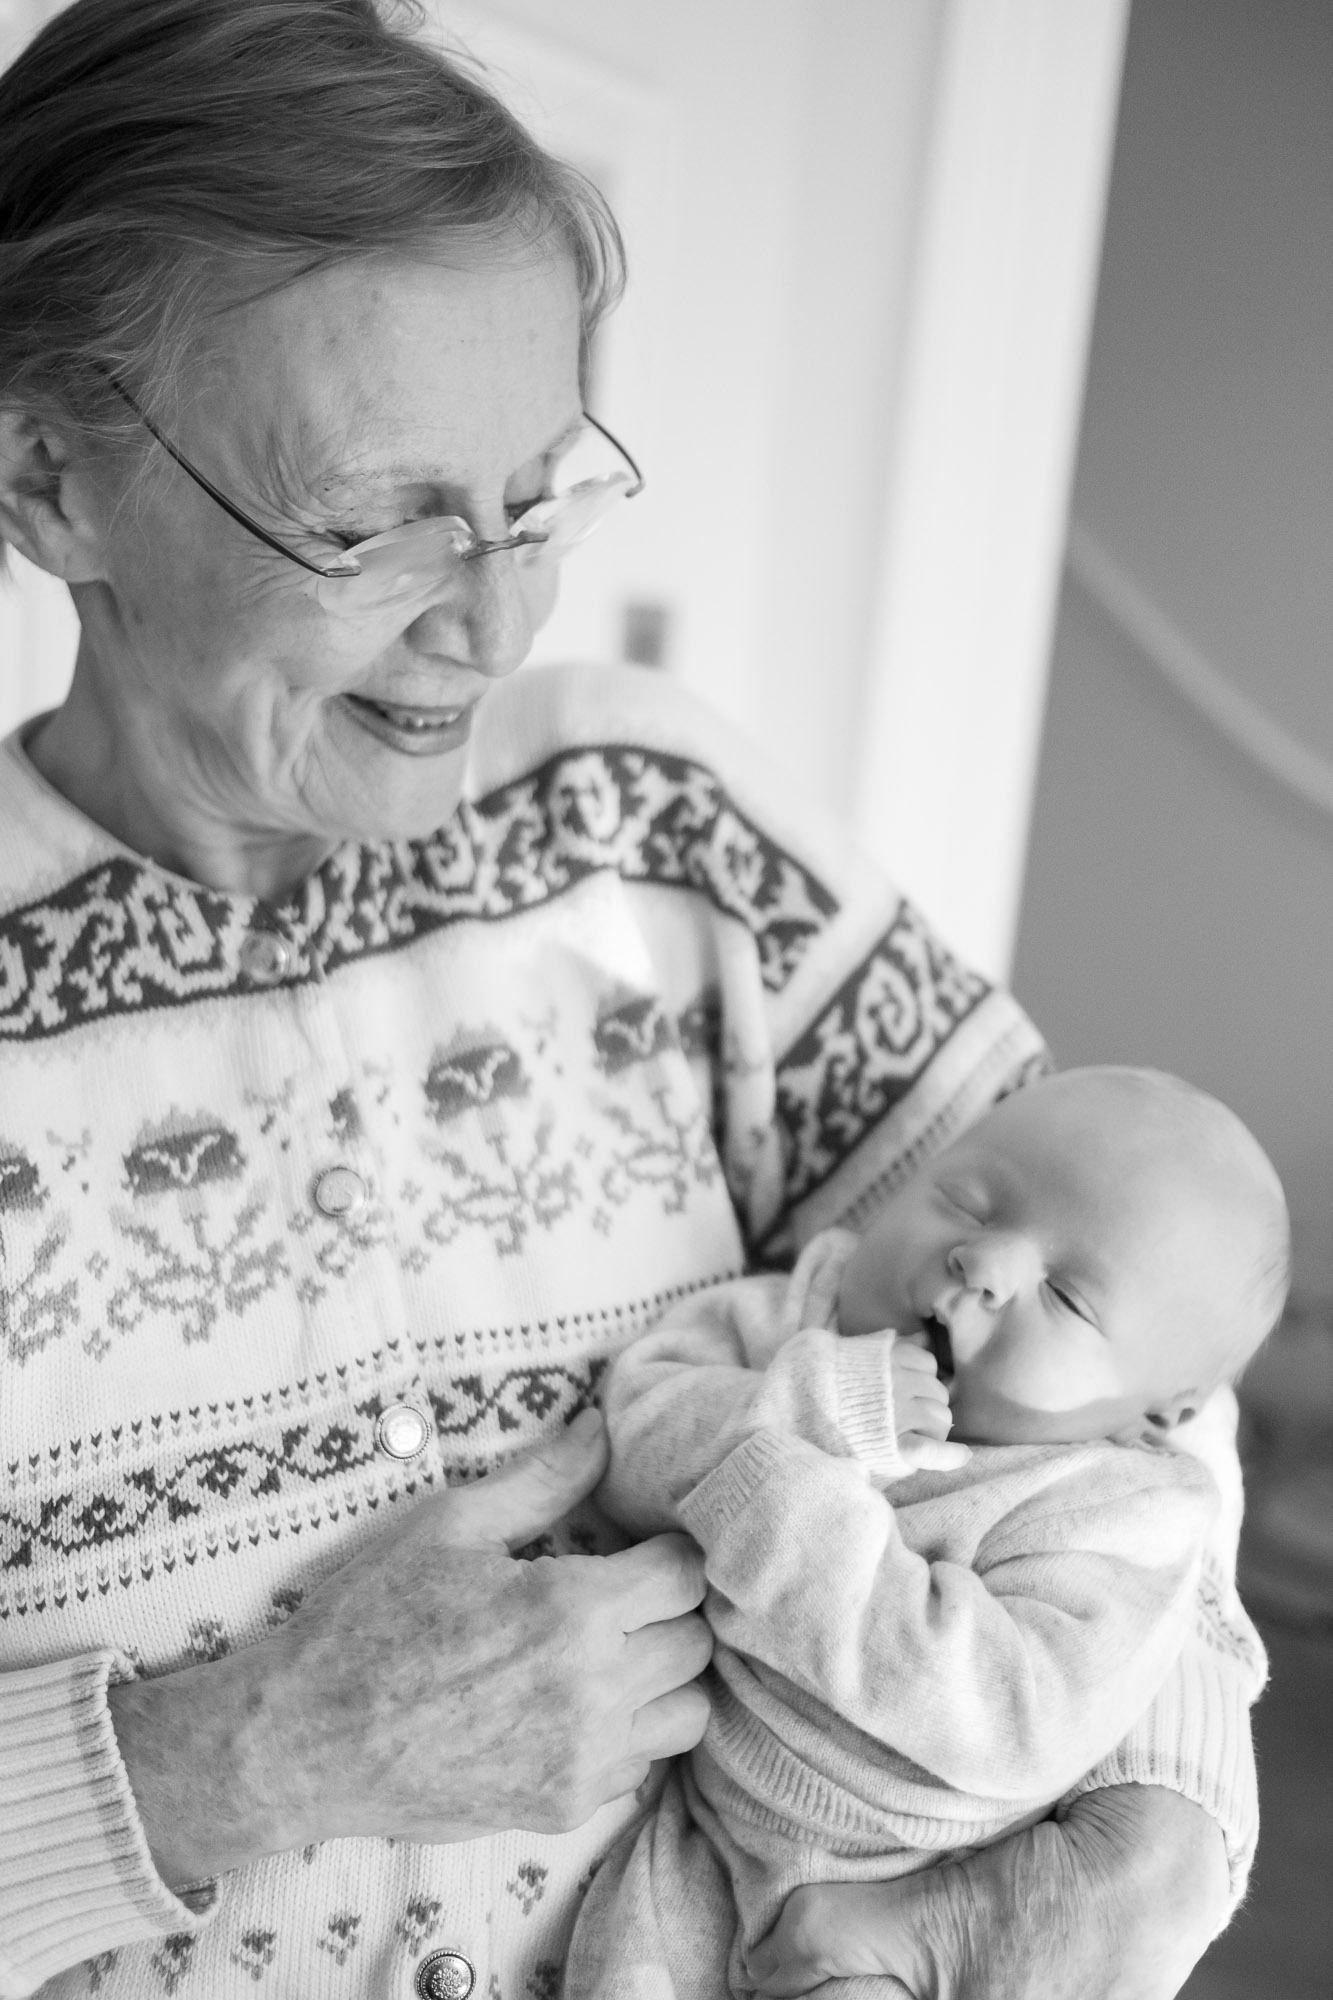 newborn-baby-family-portrait-photographer-096.jpg